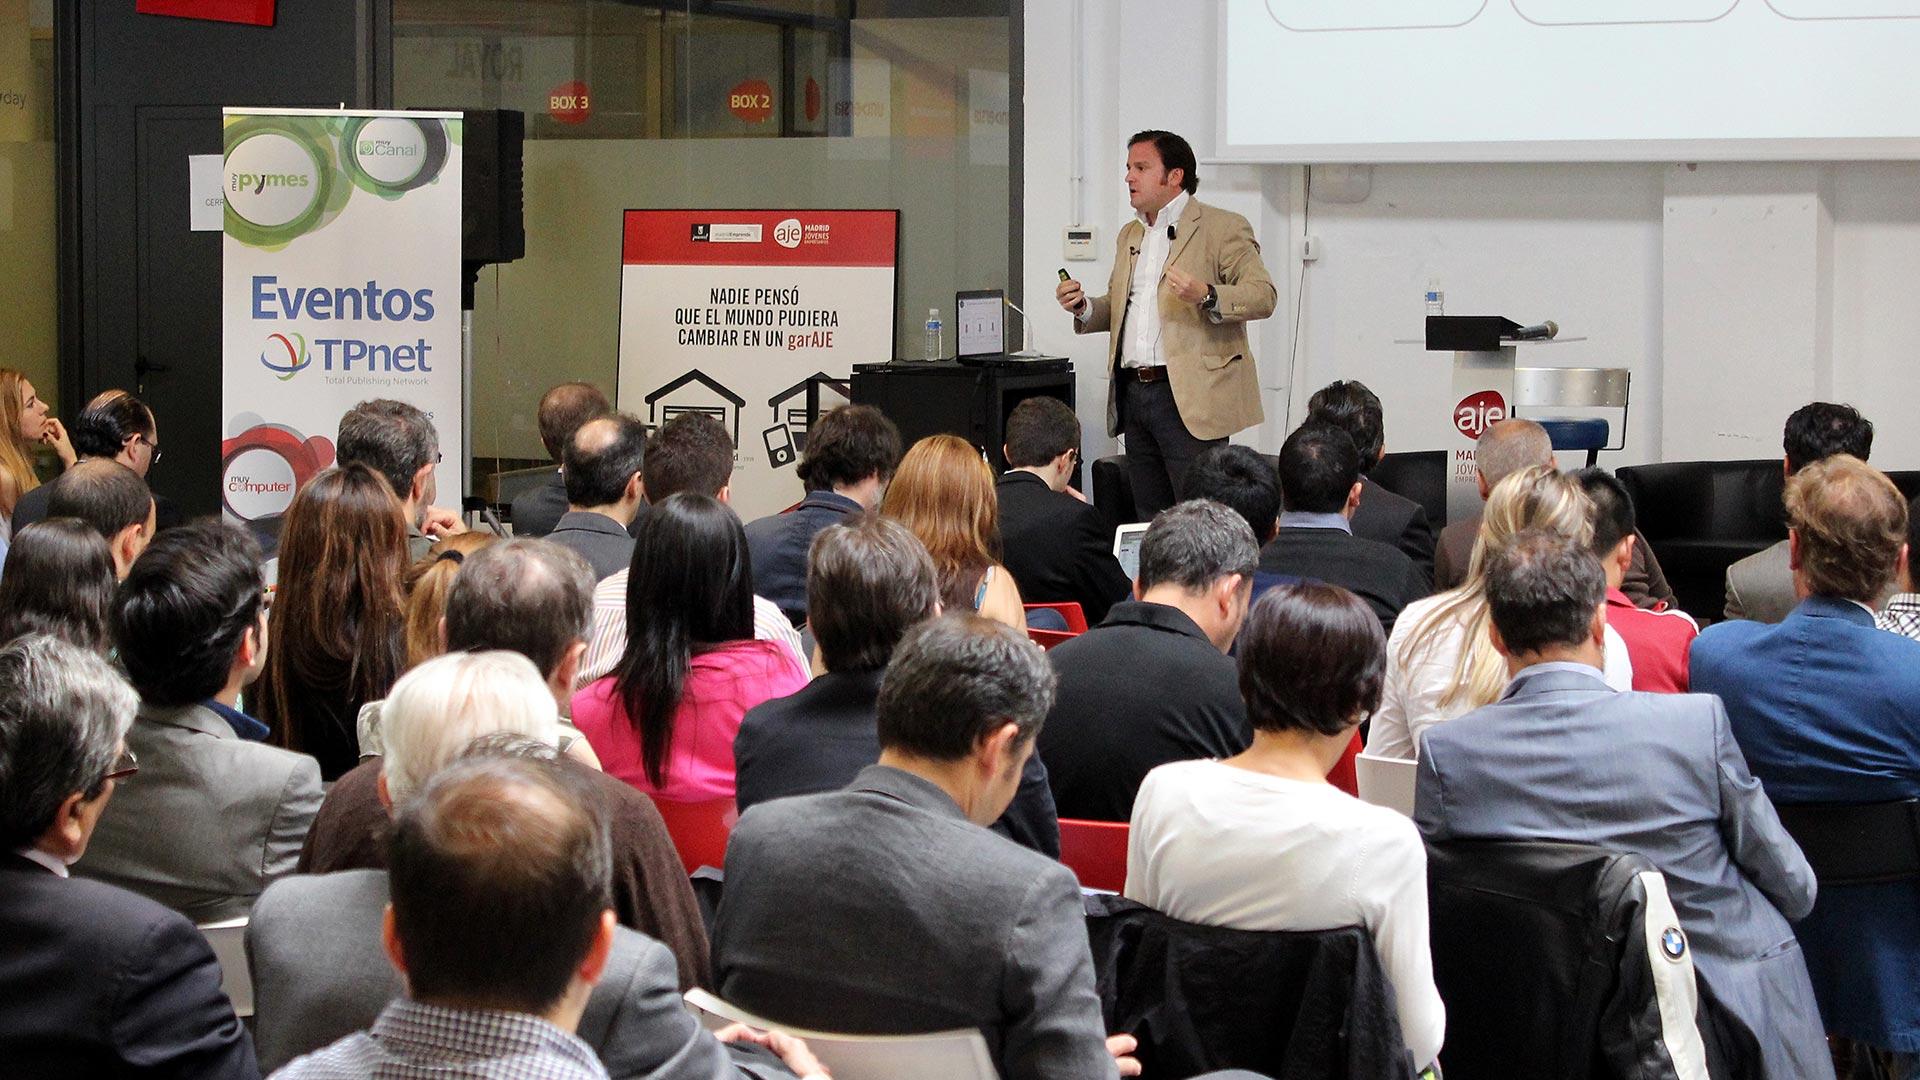 tpnet-eventos-encuentros-profesionales-iot-publico-javier-goikoetxea-next-seguros